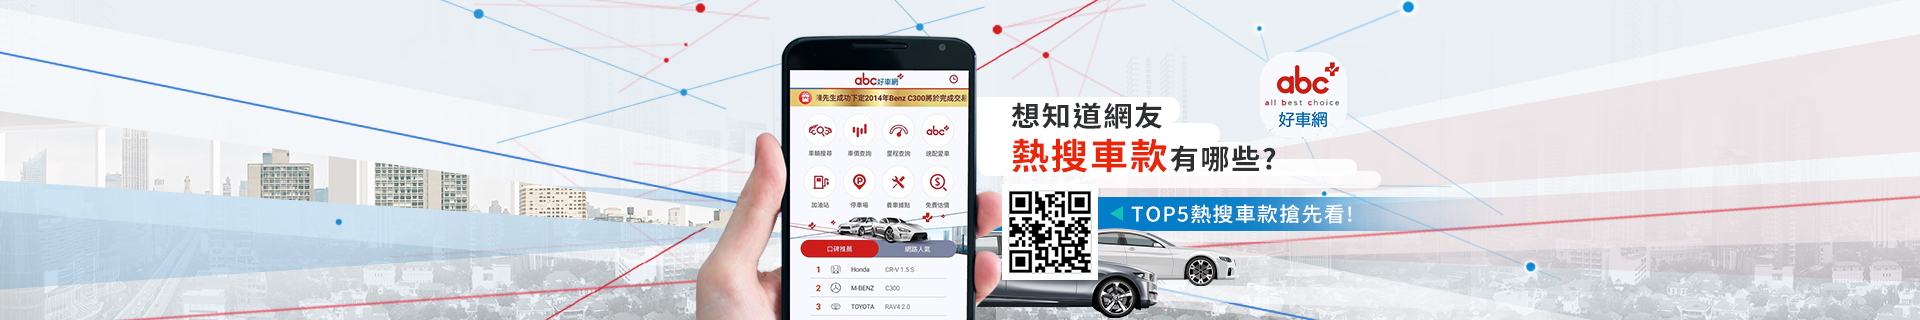 abc好車網 App 想知道網友熱搜車款有哪些? TOP5熱搜搶先看